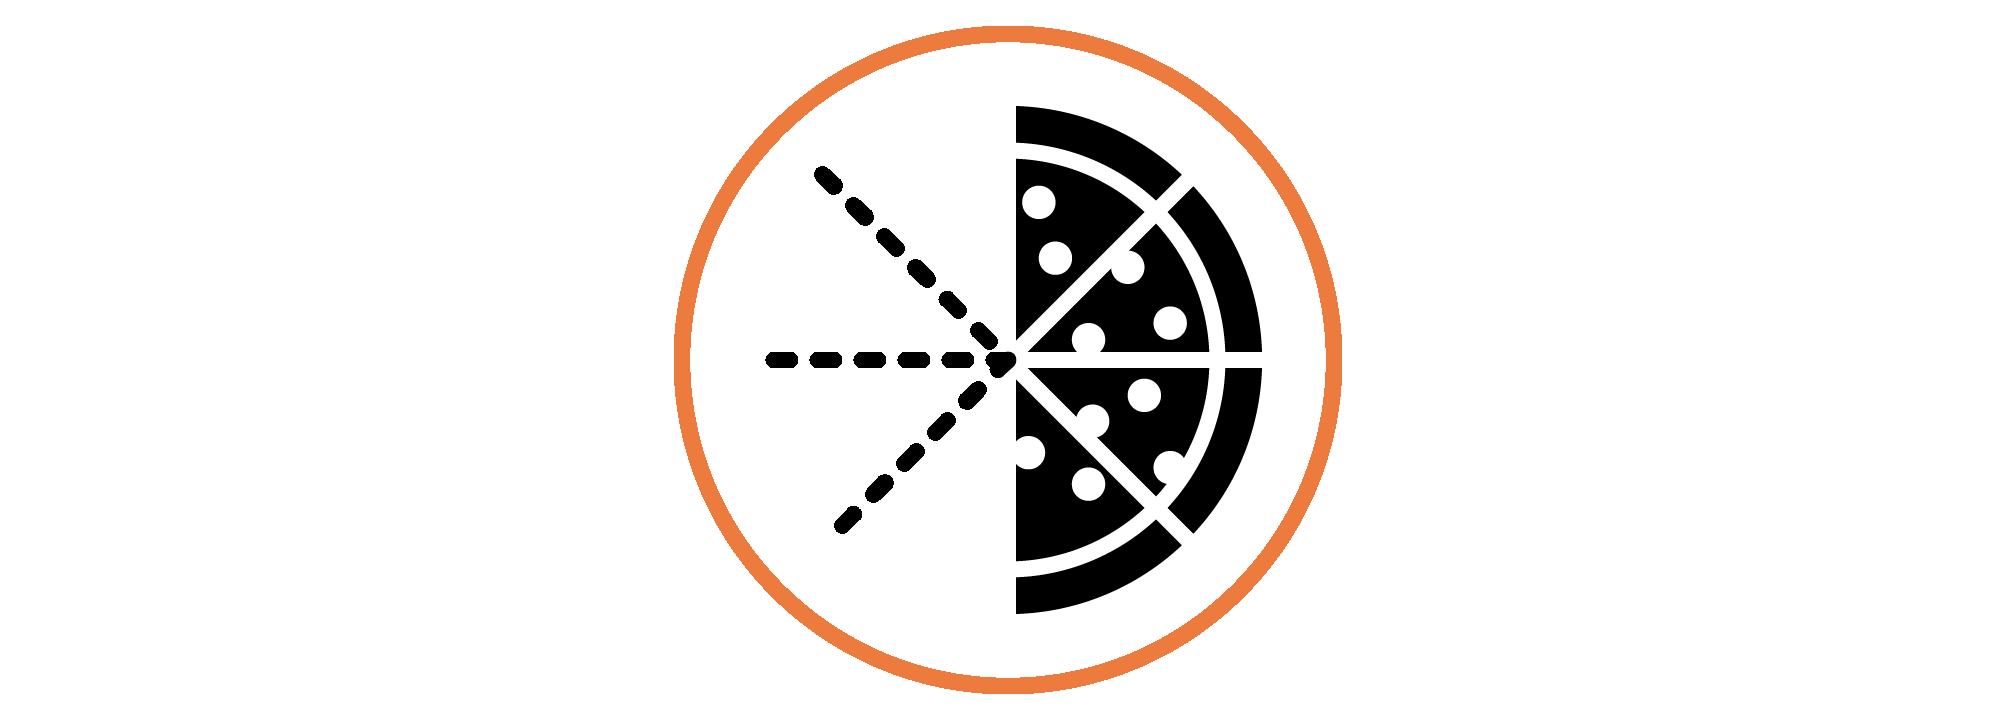 icon-rewards_2-wide.png